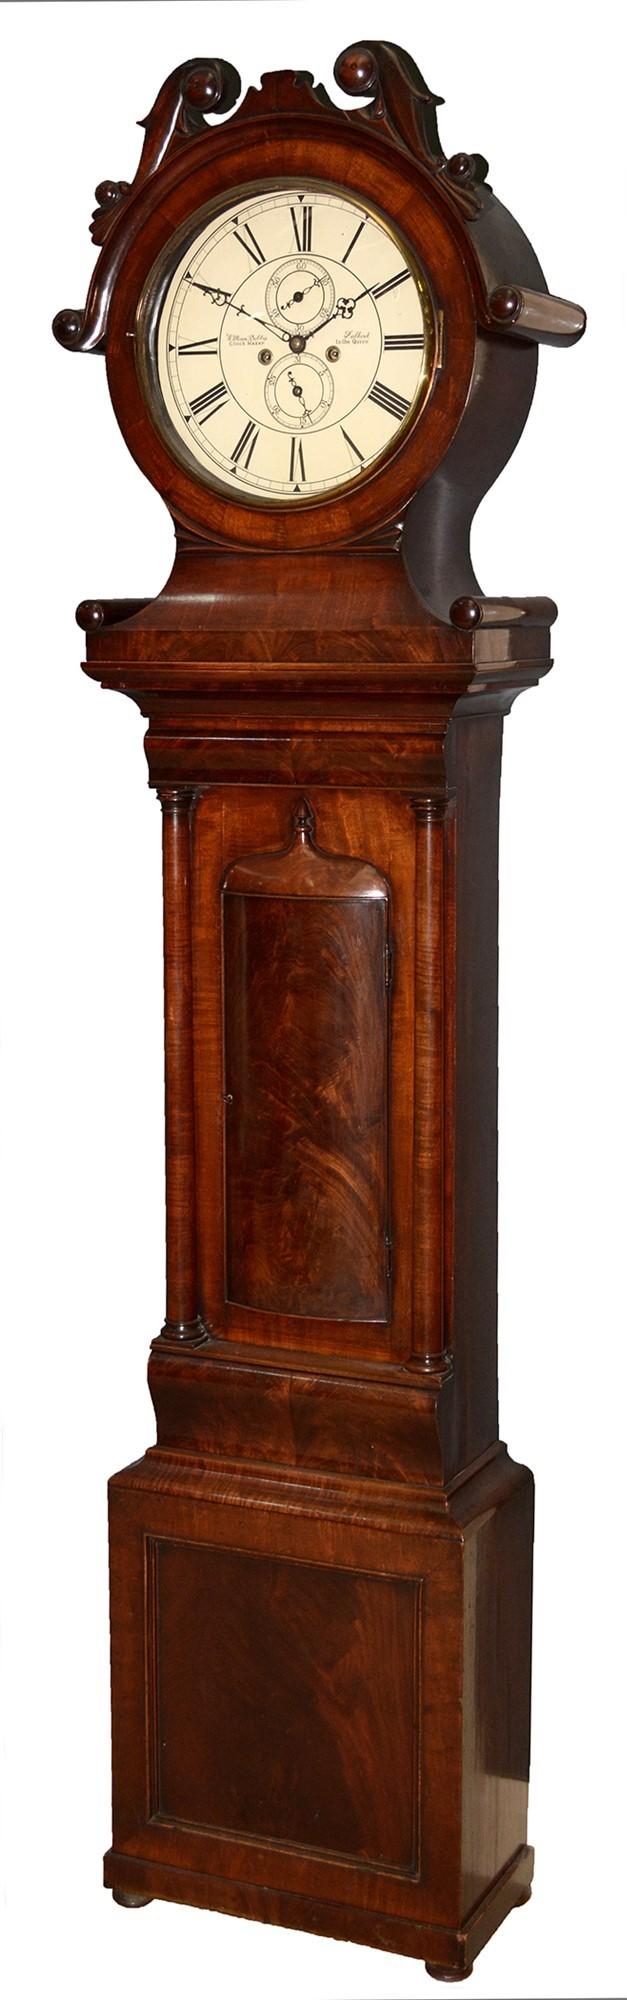 William Dobbie, Falkirk: a Scottish mahogany longcase clock,